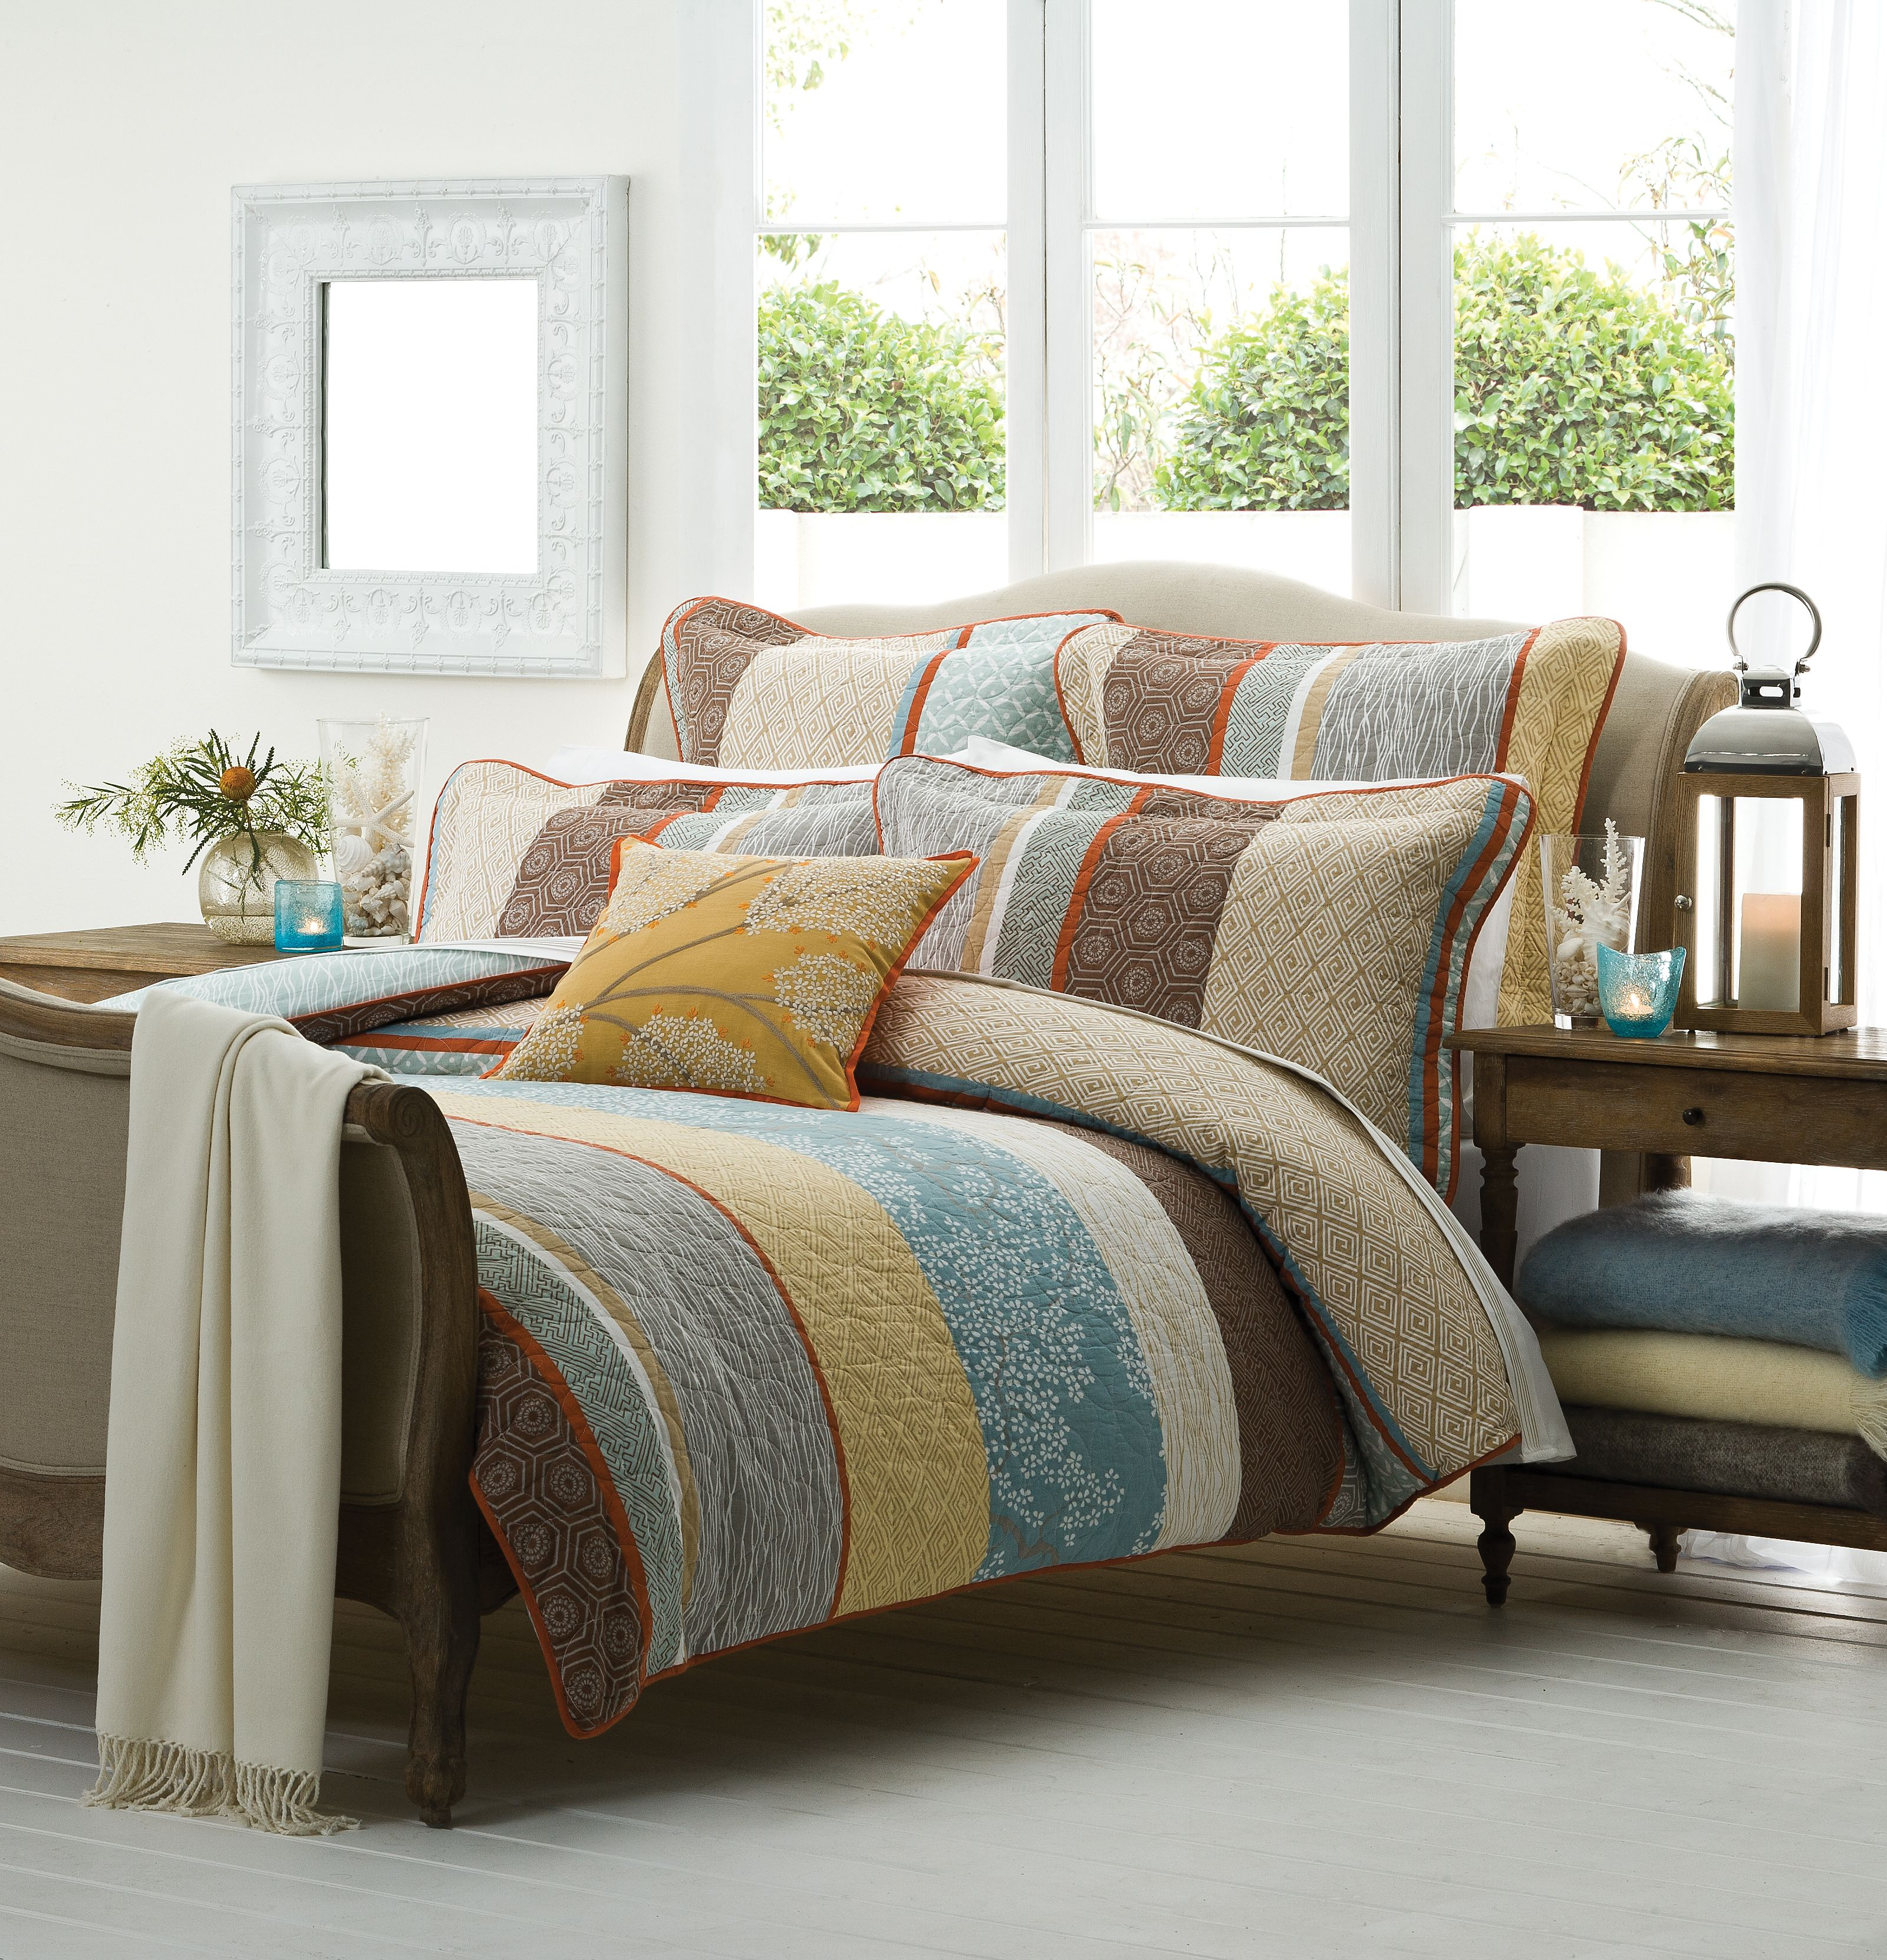 Warm ochre hues and soft blossom prints evoke understated